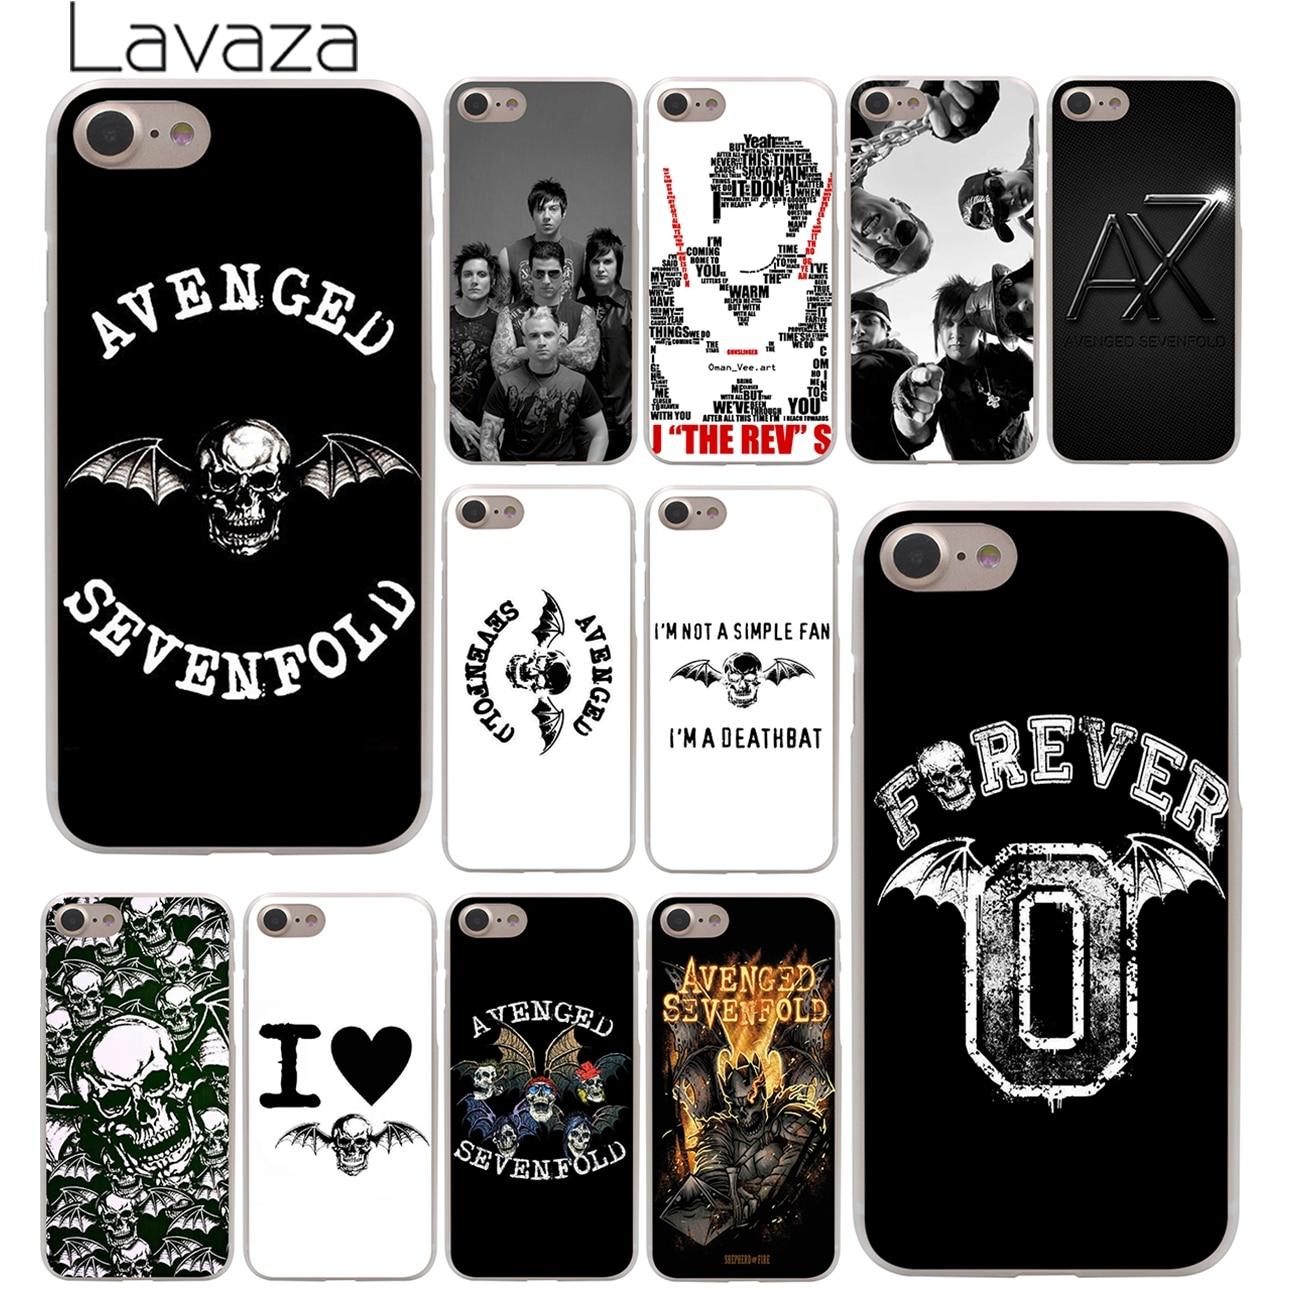 Avenged Sevenfold Hard Case Transparent for iPhone 7 7 Plus 6 6s Plus 5 5S SE 5C 4 4S